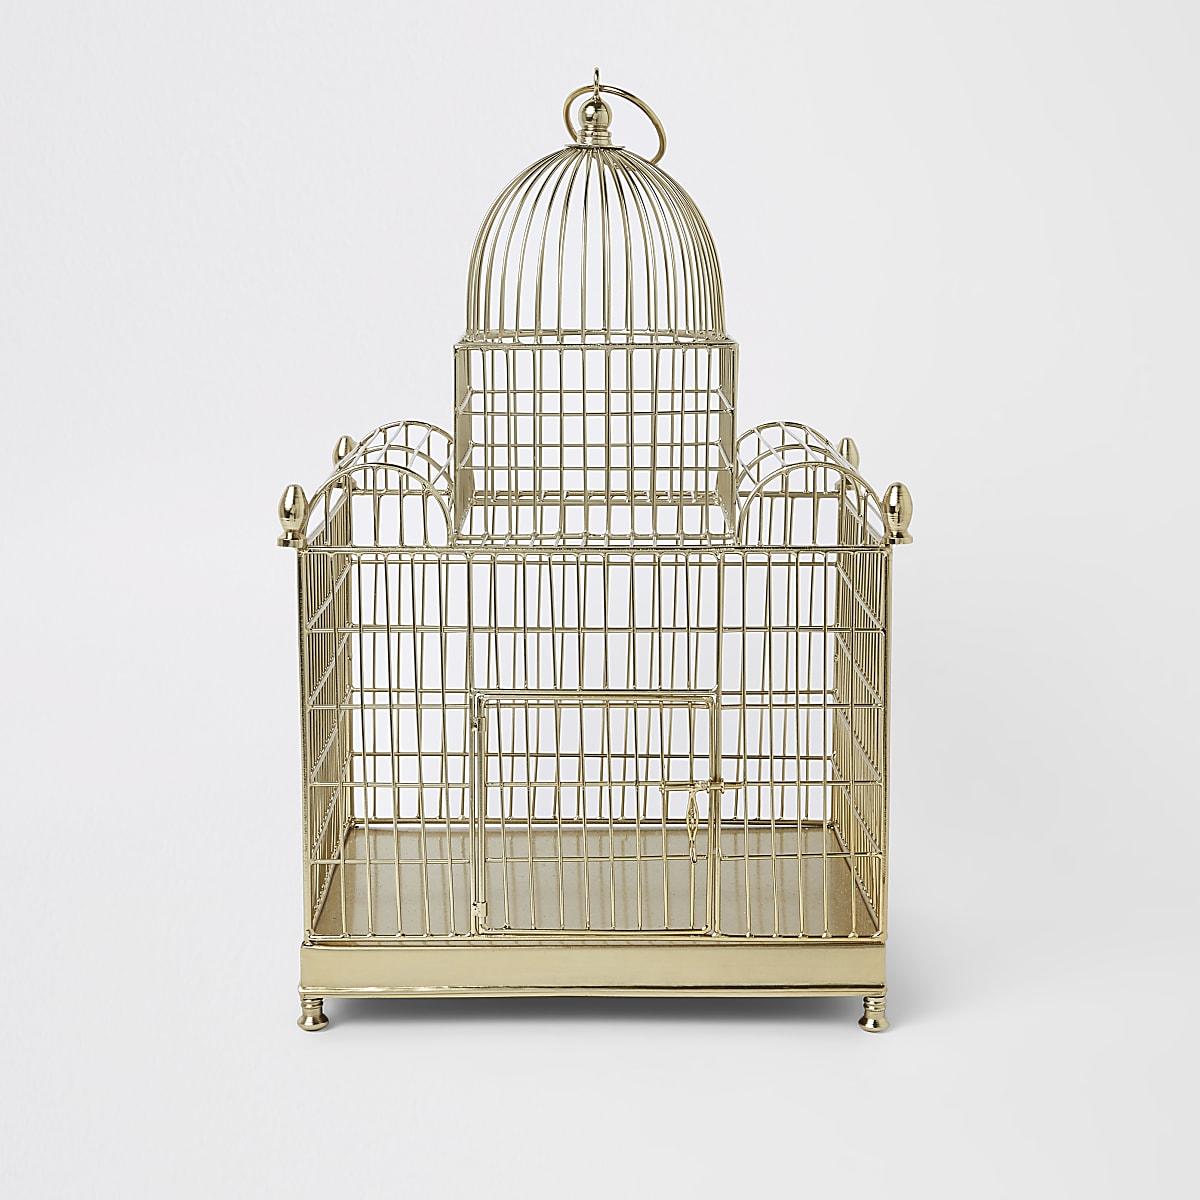 Decorative birdcage